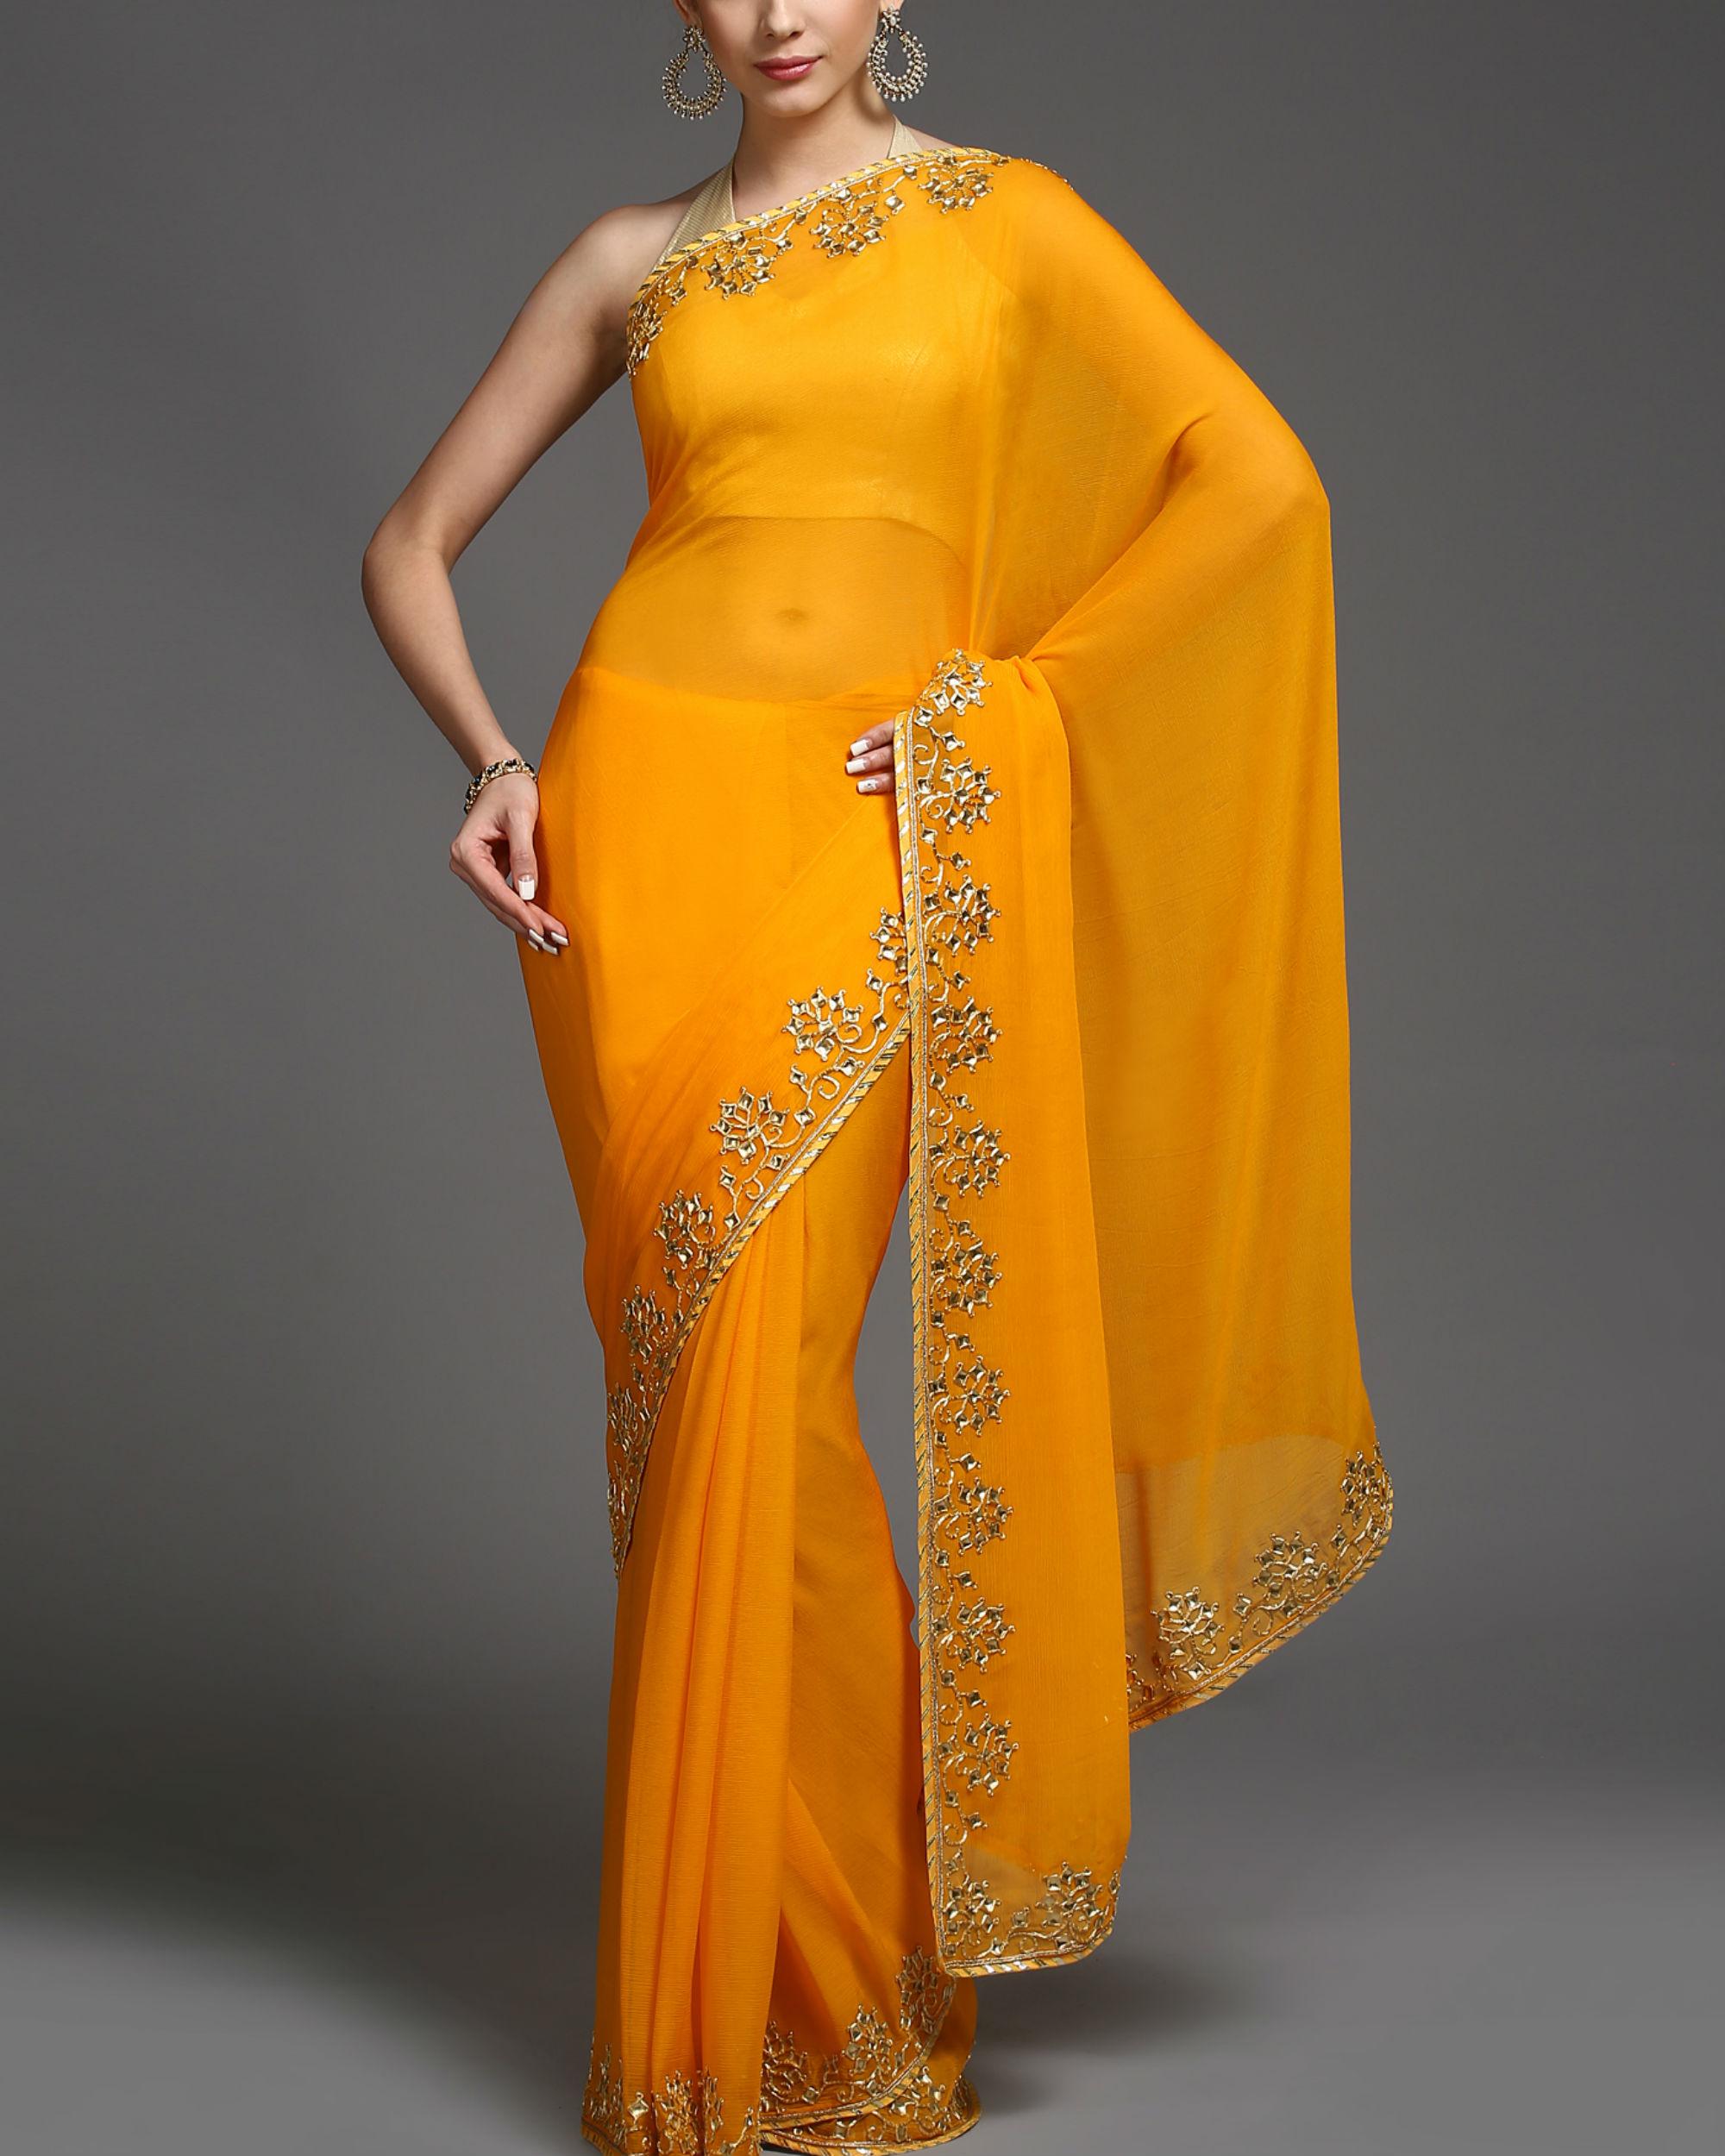 Saffron and gold sari